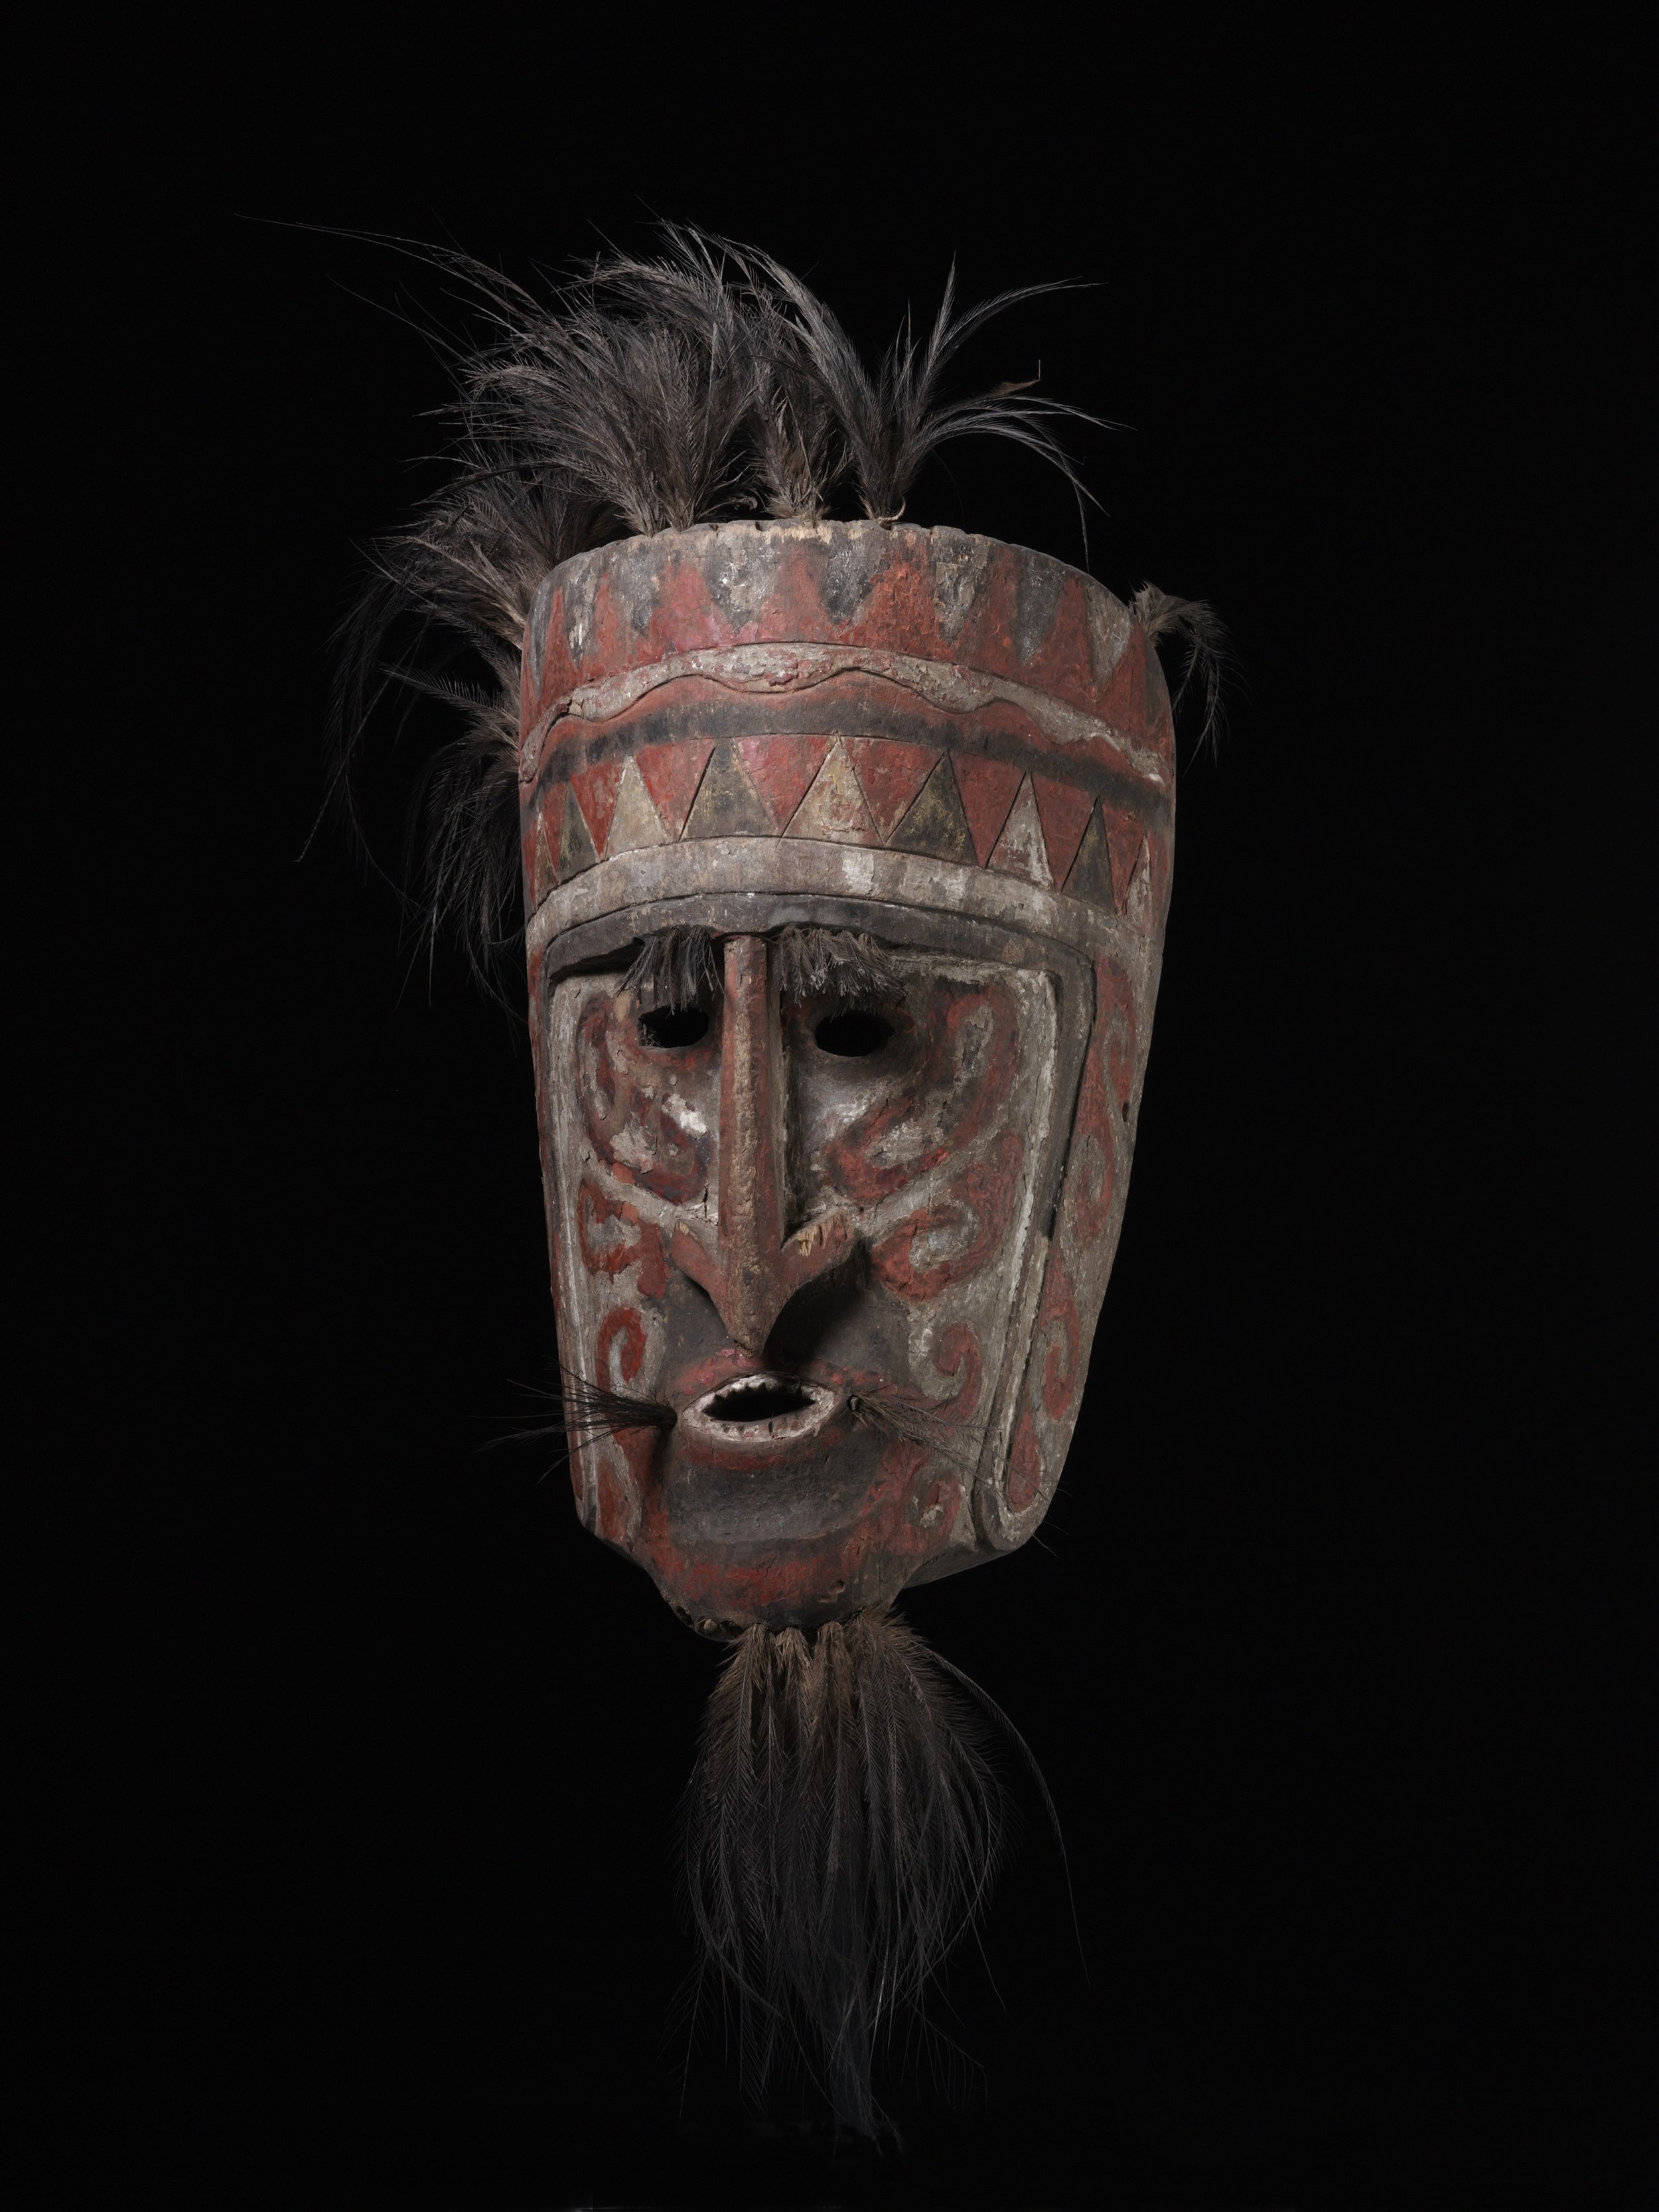 Wandalai Dance Mask | West Papua © de Young | Fine Arts Museums of San Francisco